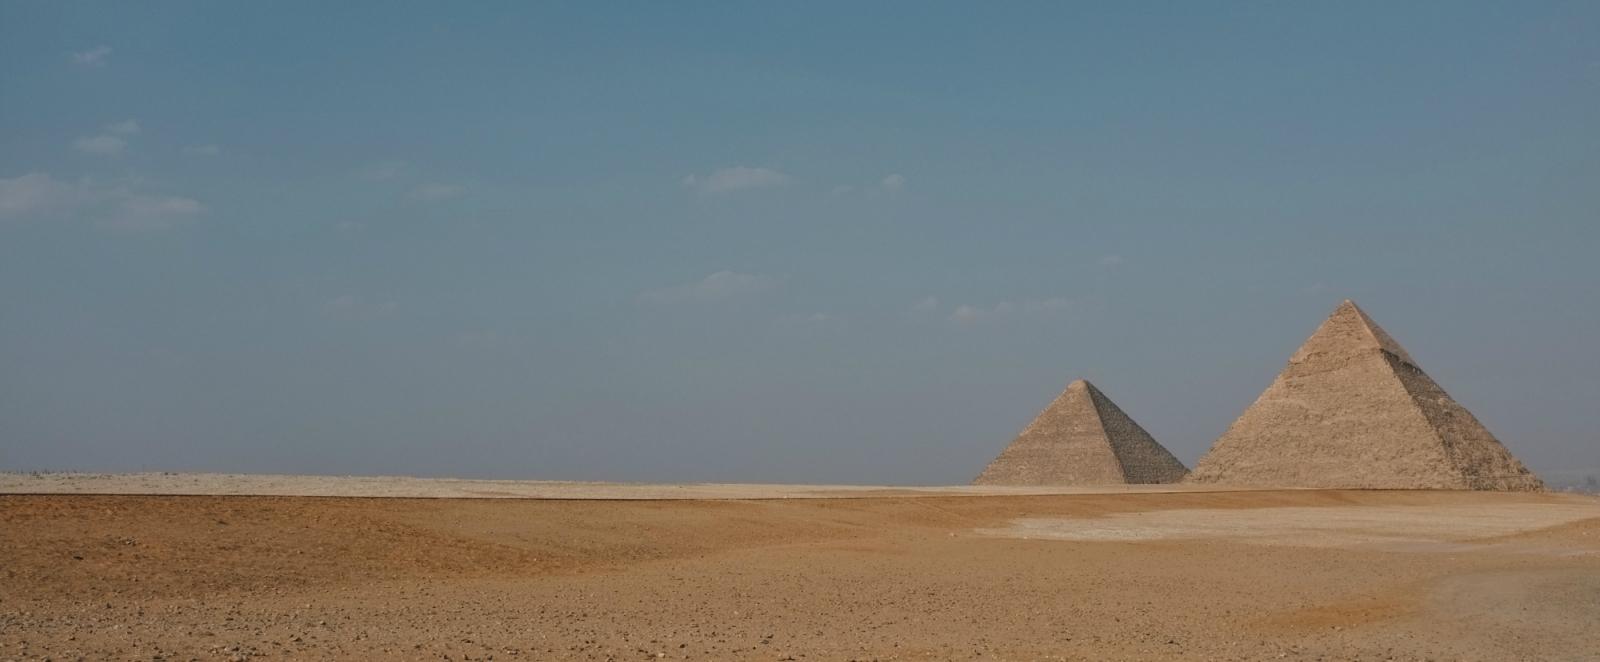 The Great Pyramid's Secret Code | Edgar Cayce's A R E